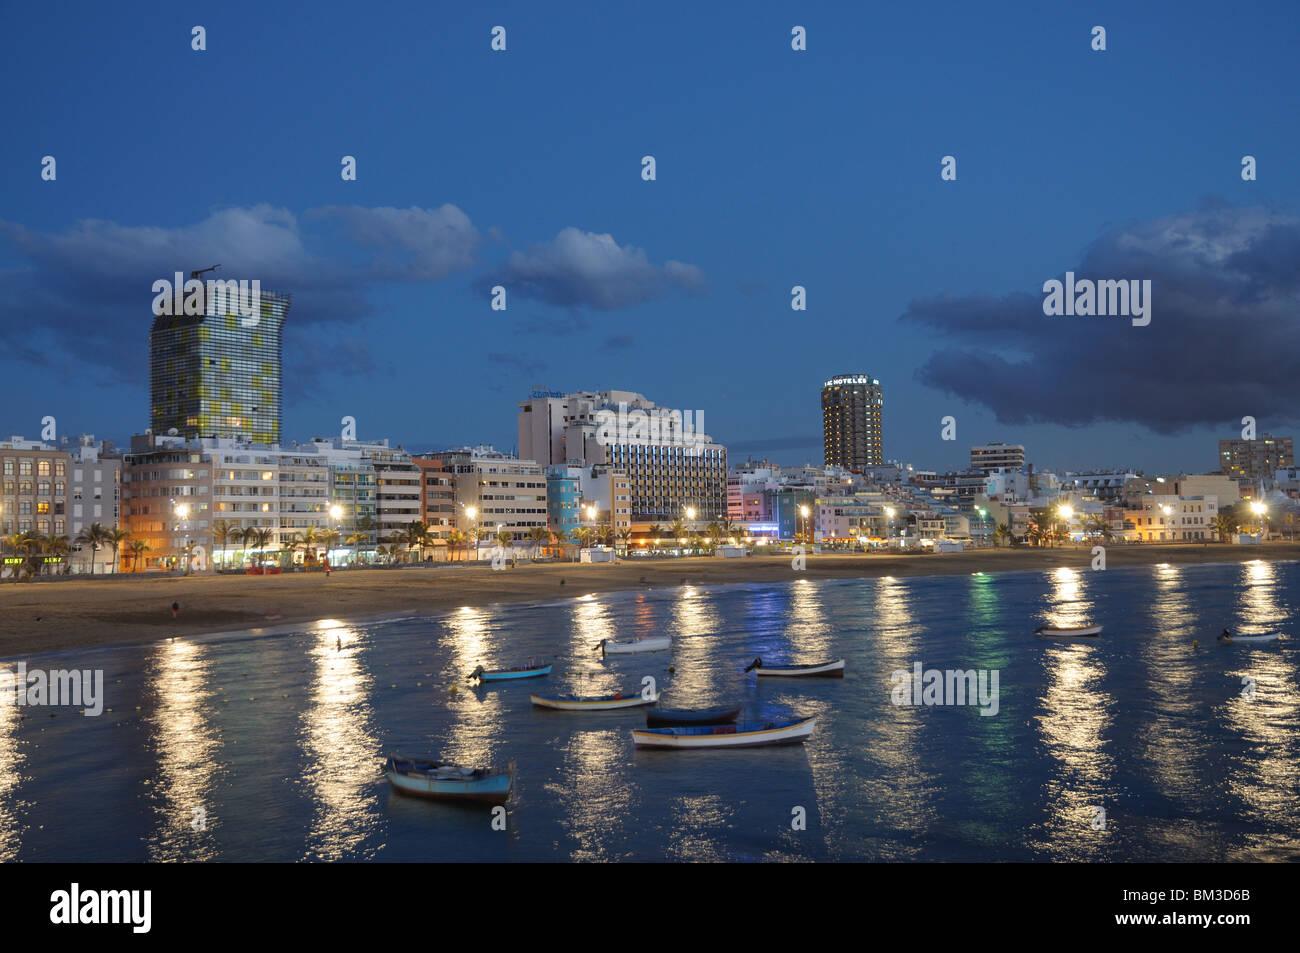 Las Palmas de Gran Canaria at night, Grand Canary Spain - Stock Image